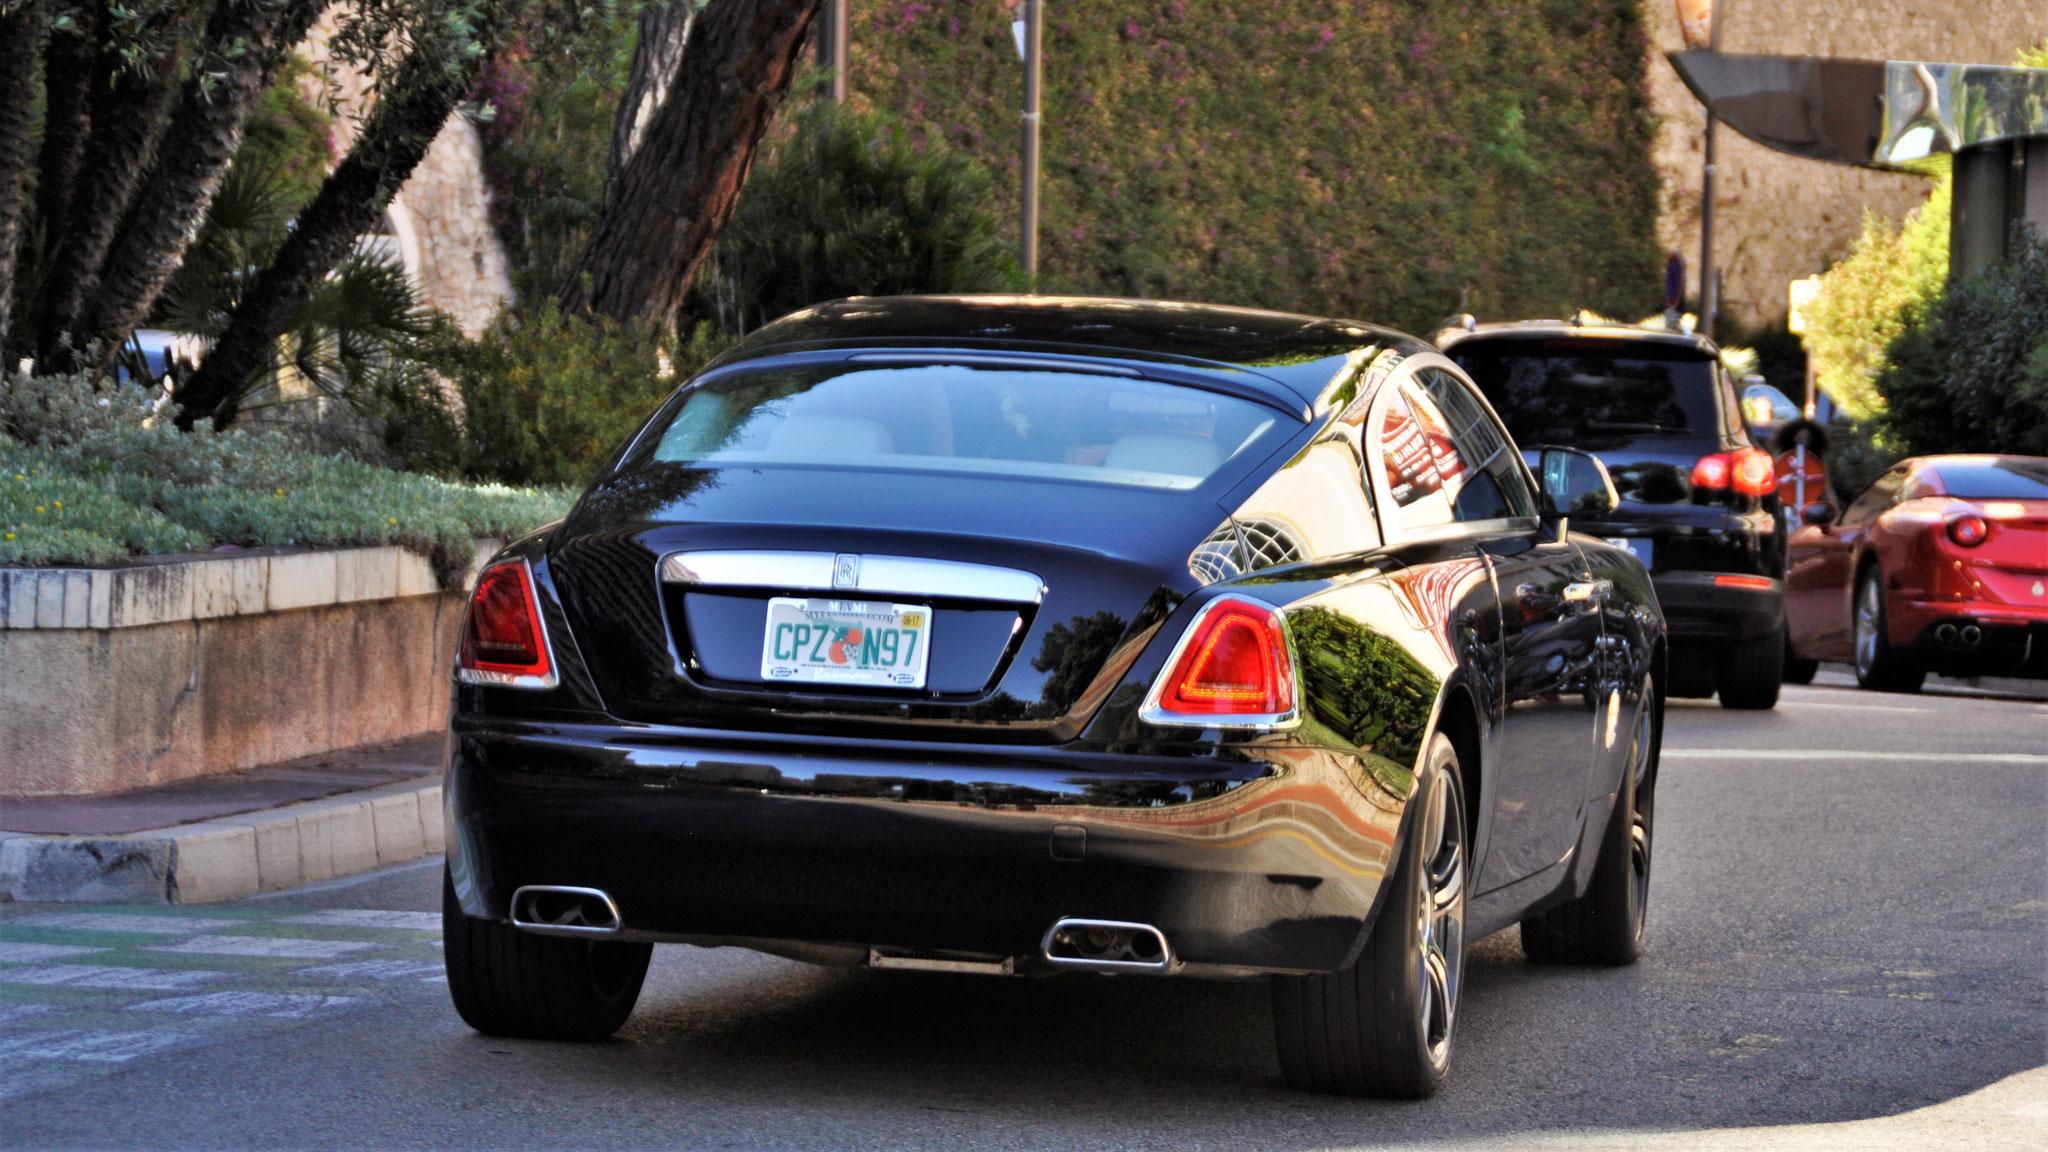 Rolls Royce Wraith - CPZ-N97 (USA)